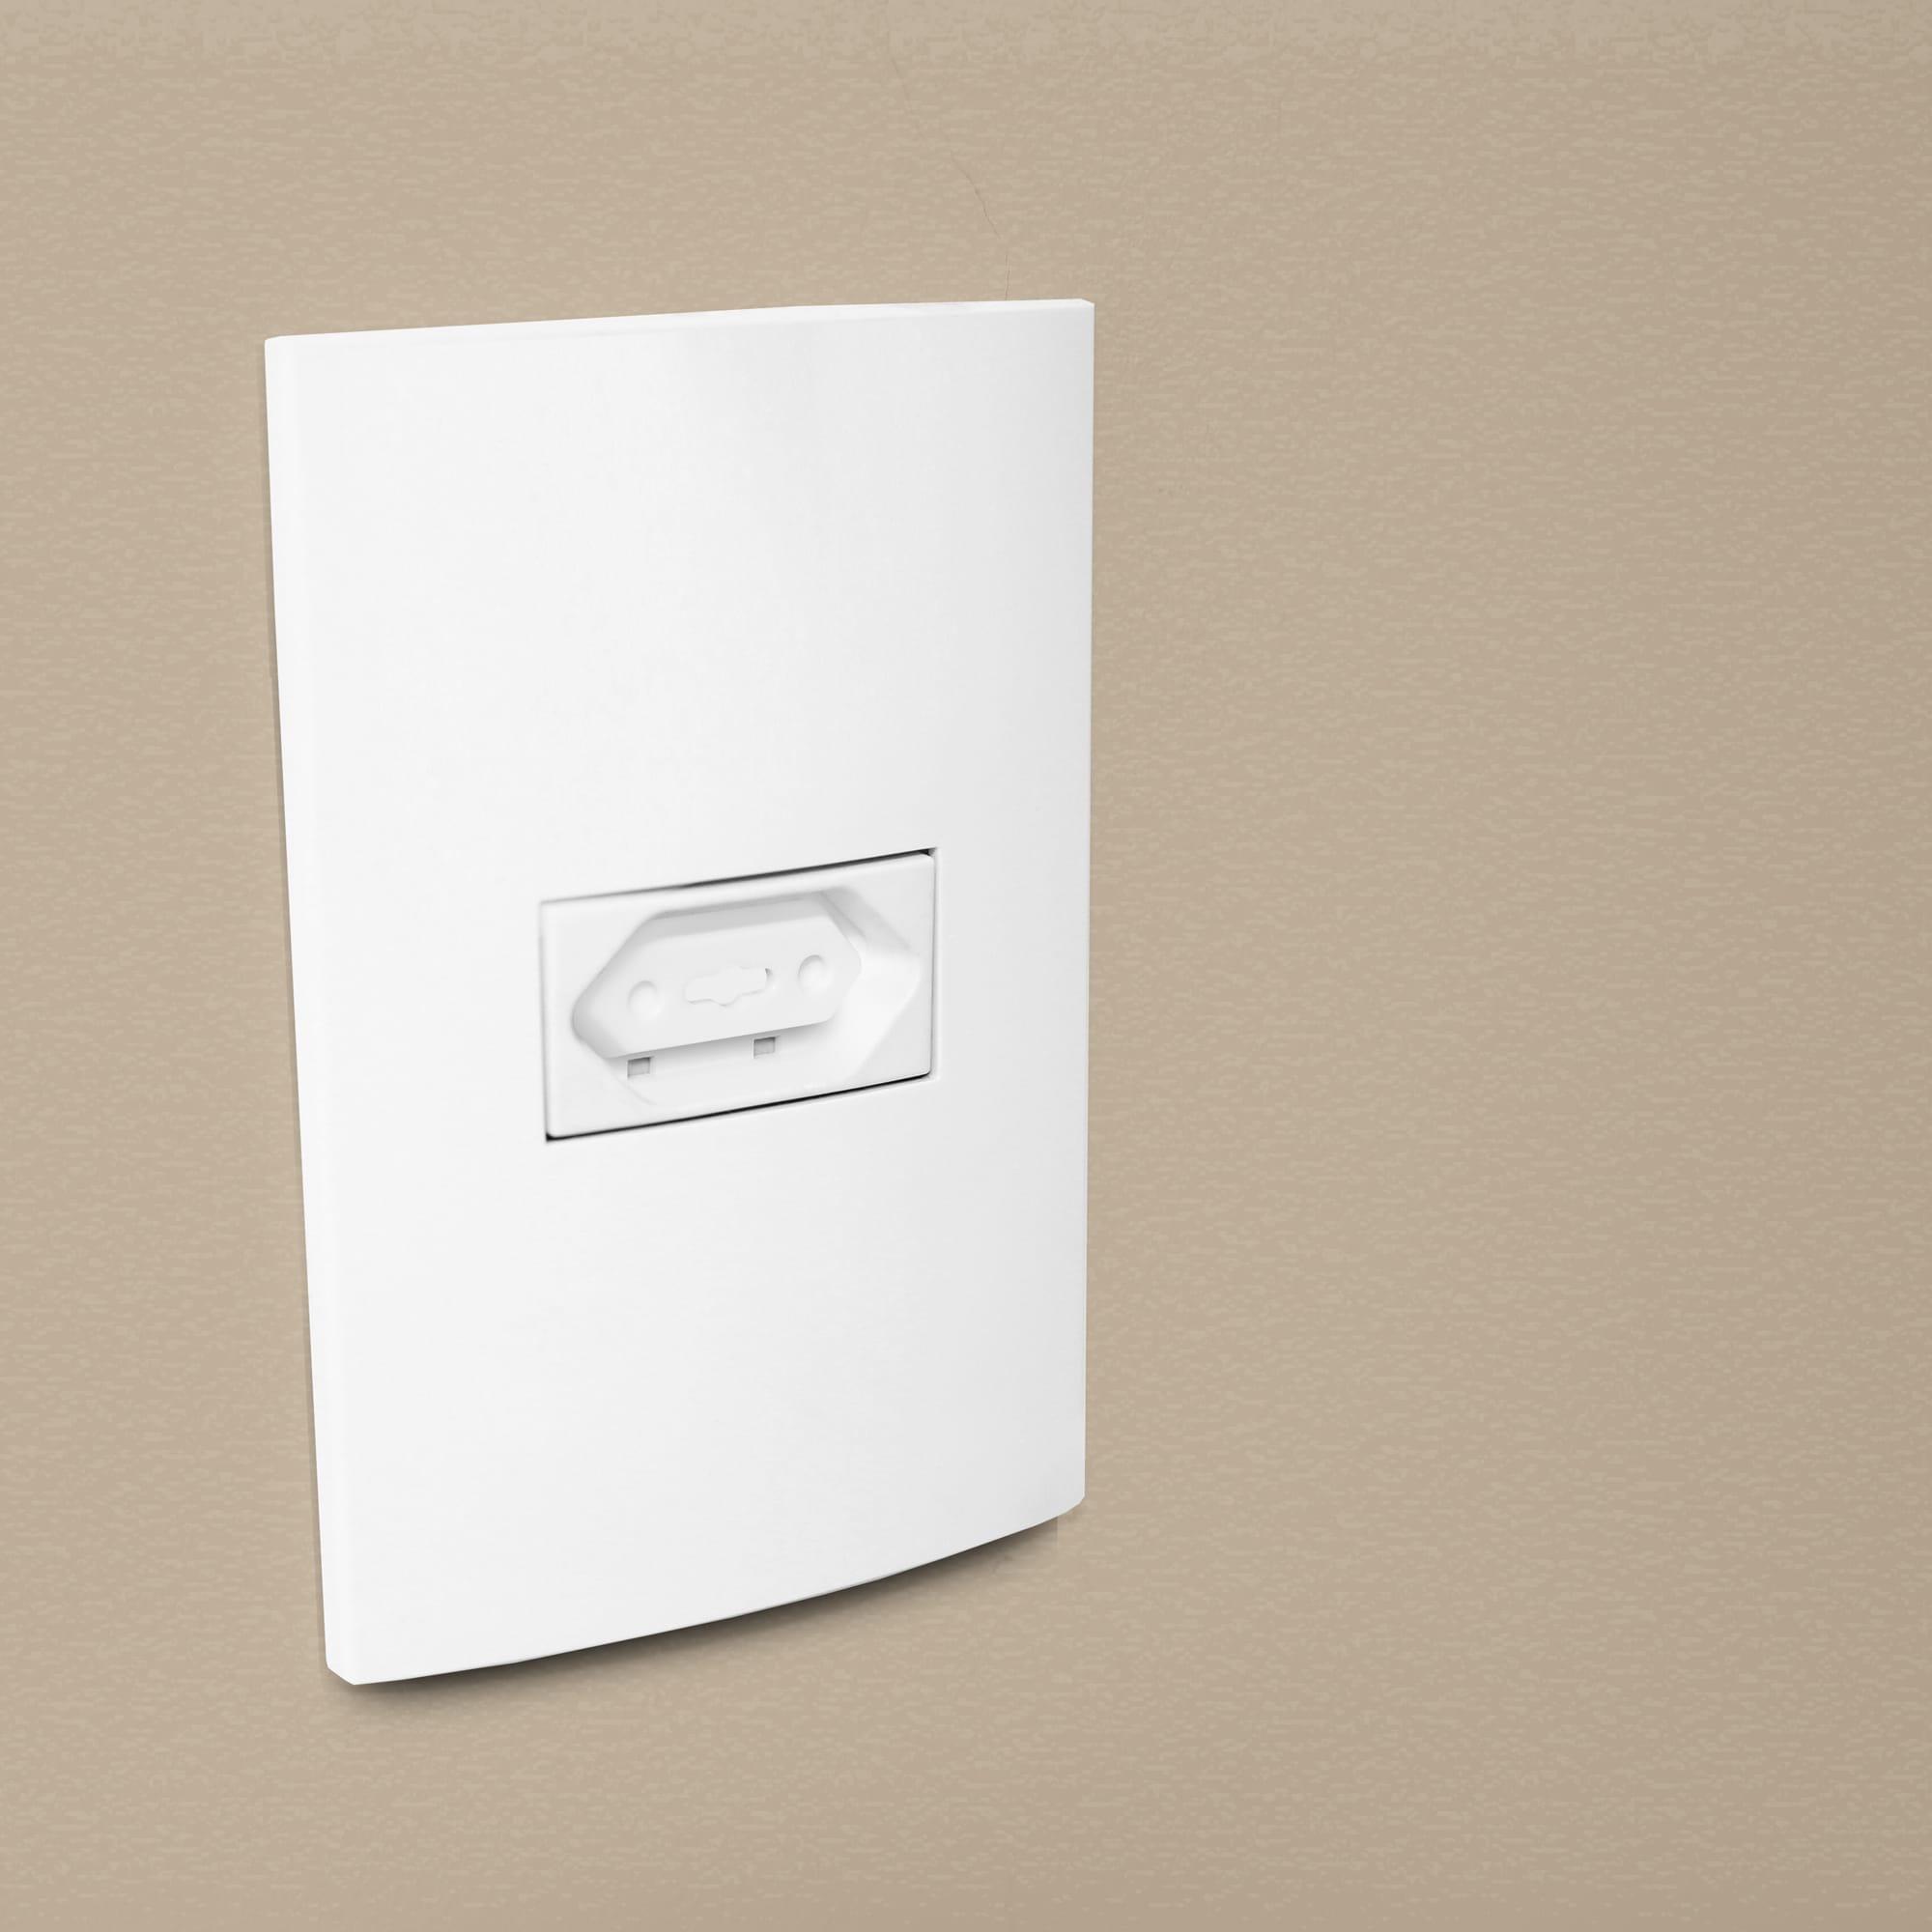 Conjunto De Protetores Para Tomada Branca 8 Unidades - Comtac